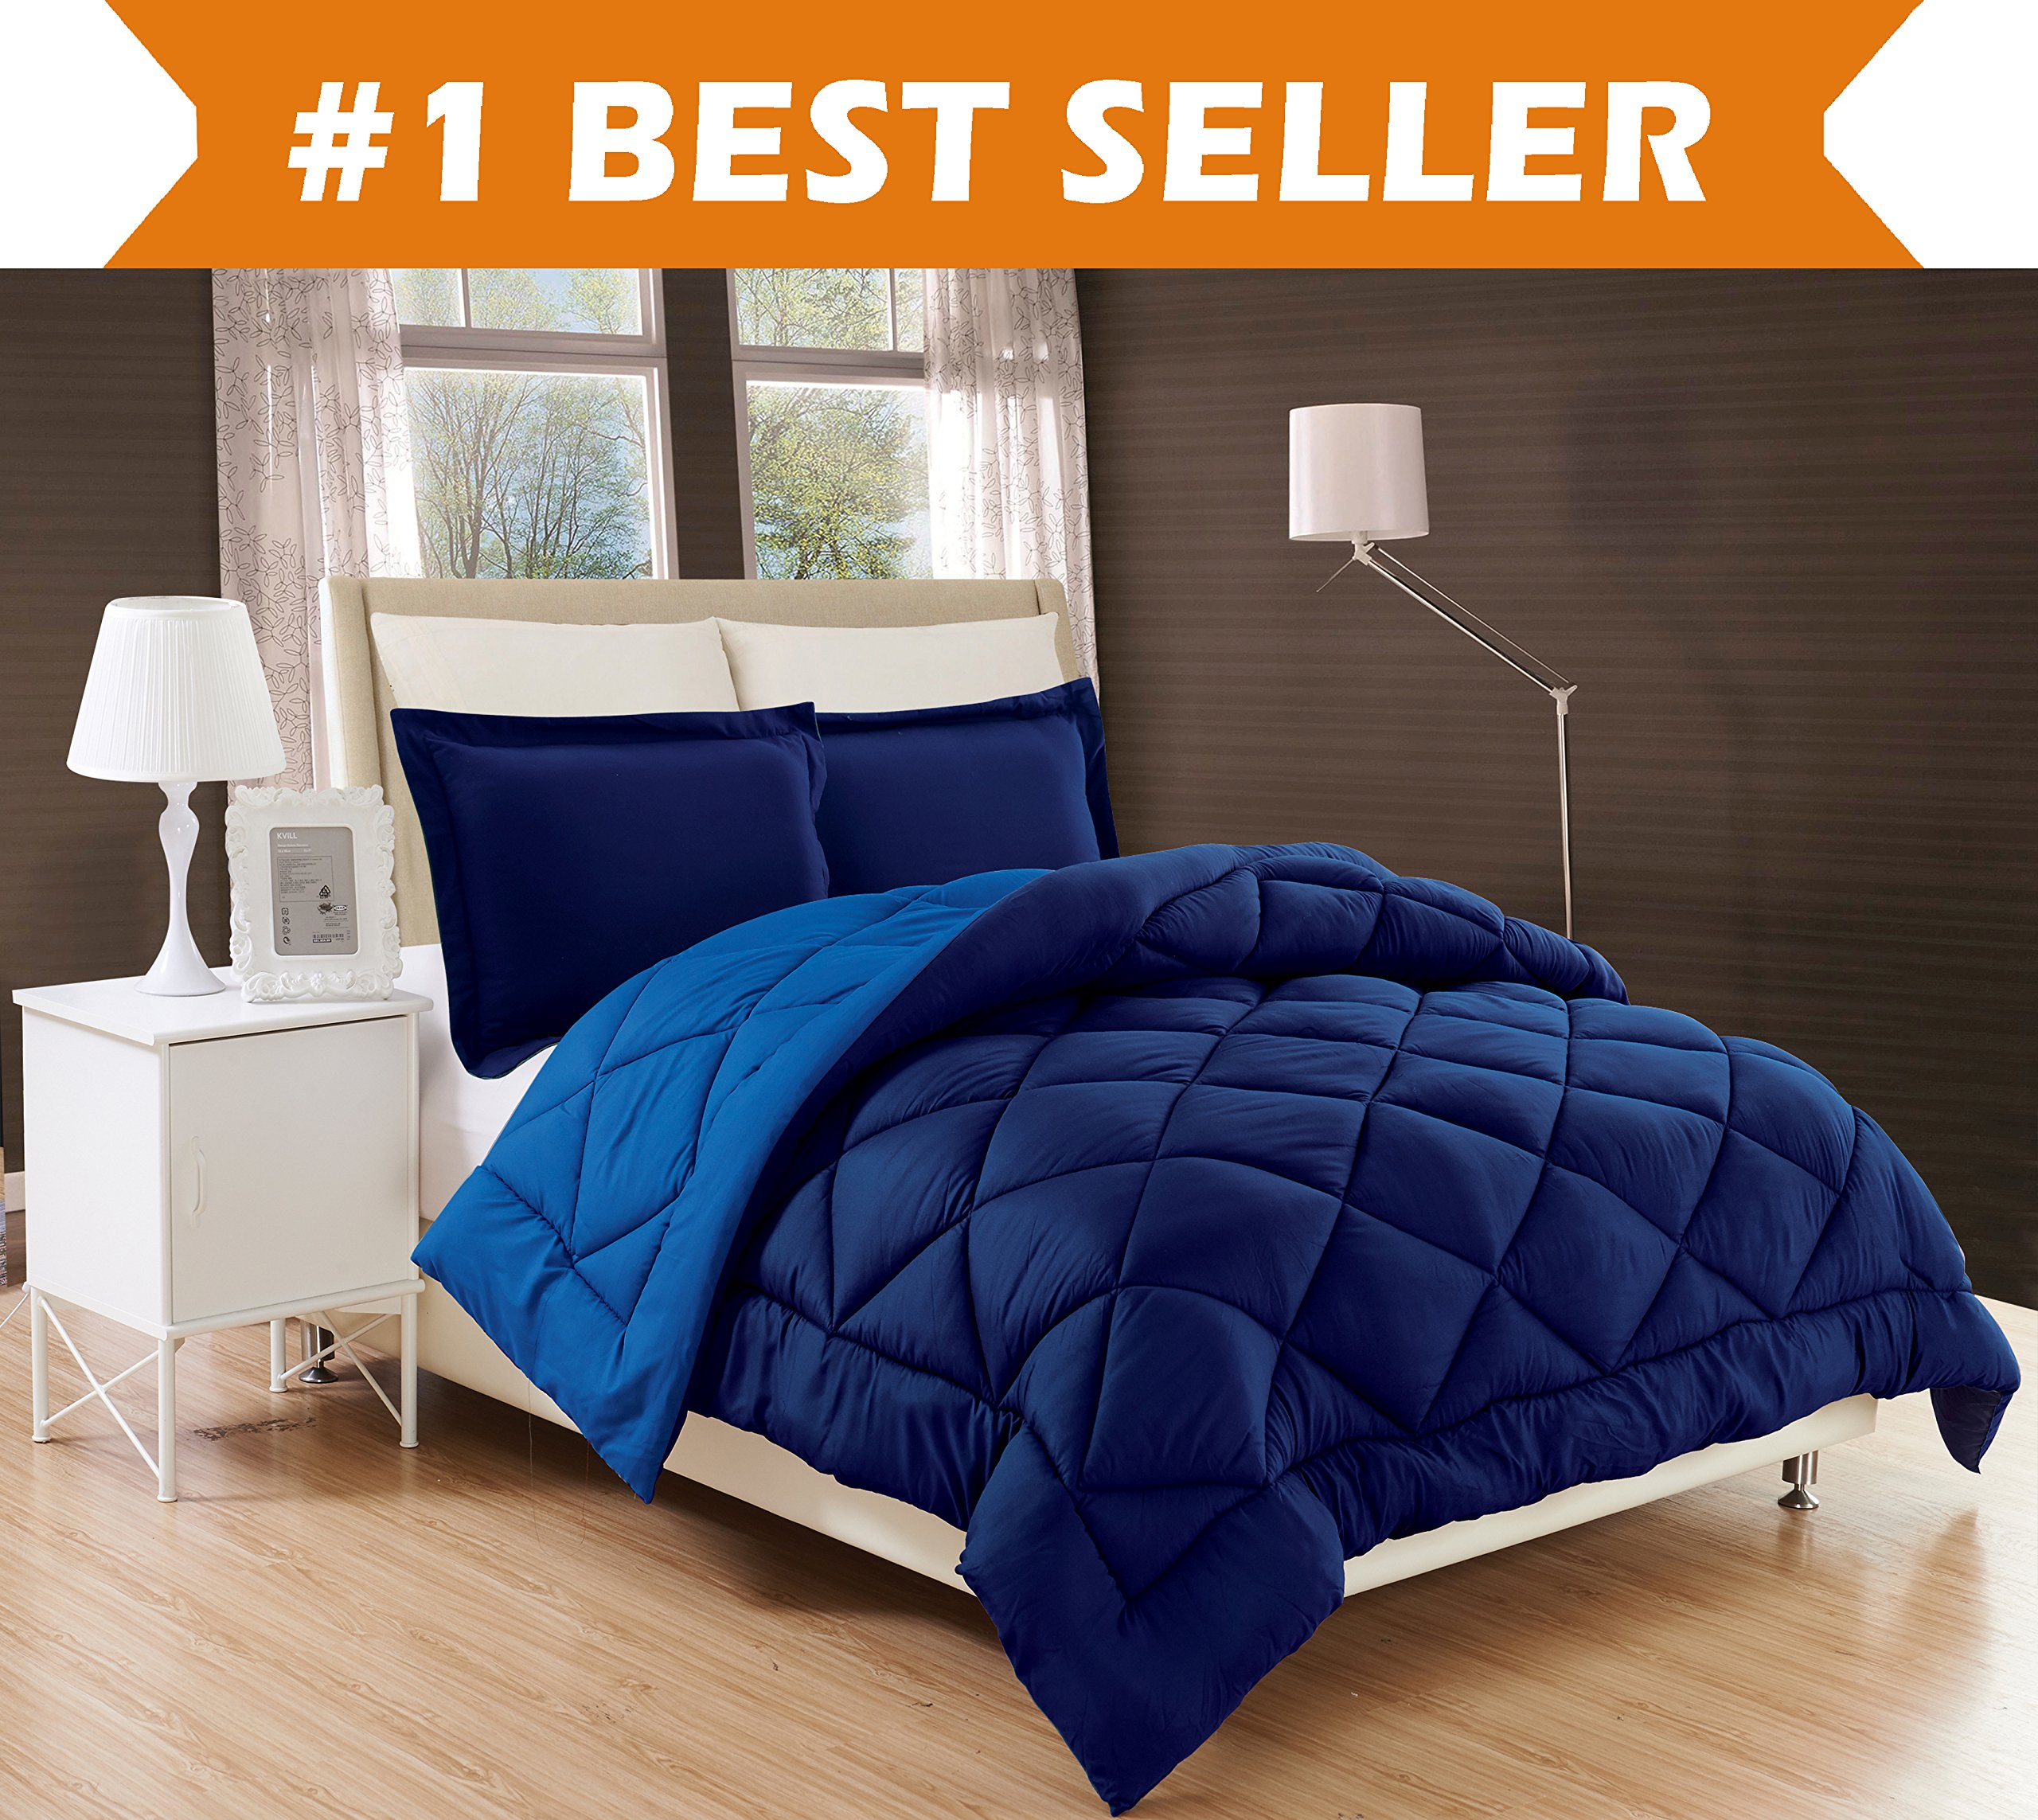 Elegant Comfort All Season Comforter and Year Round Medium Weight Super Soft Down Alternative Reversible 3-Piece Comforter Set, Full/Queen, Navy Blue/Light Blue